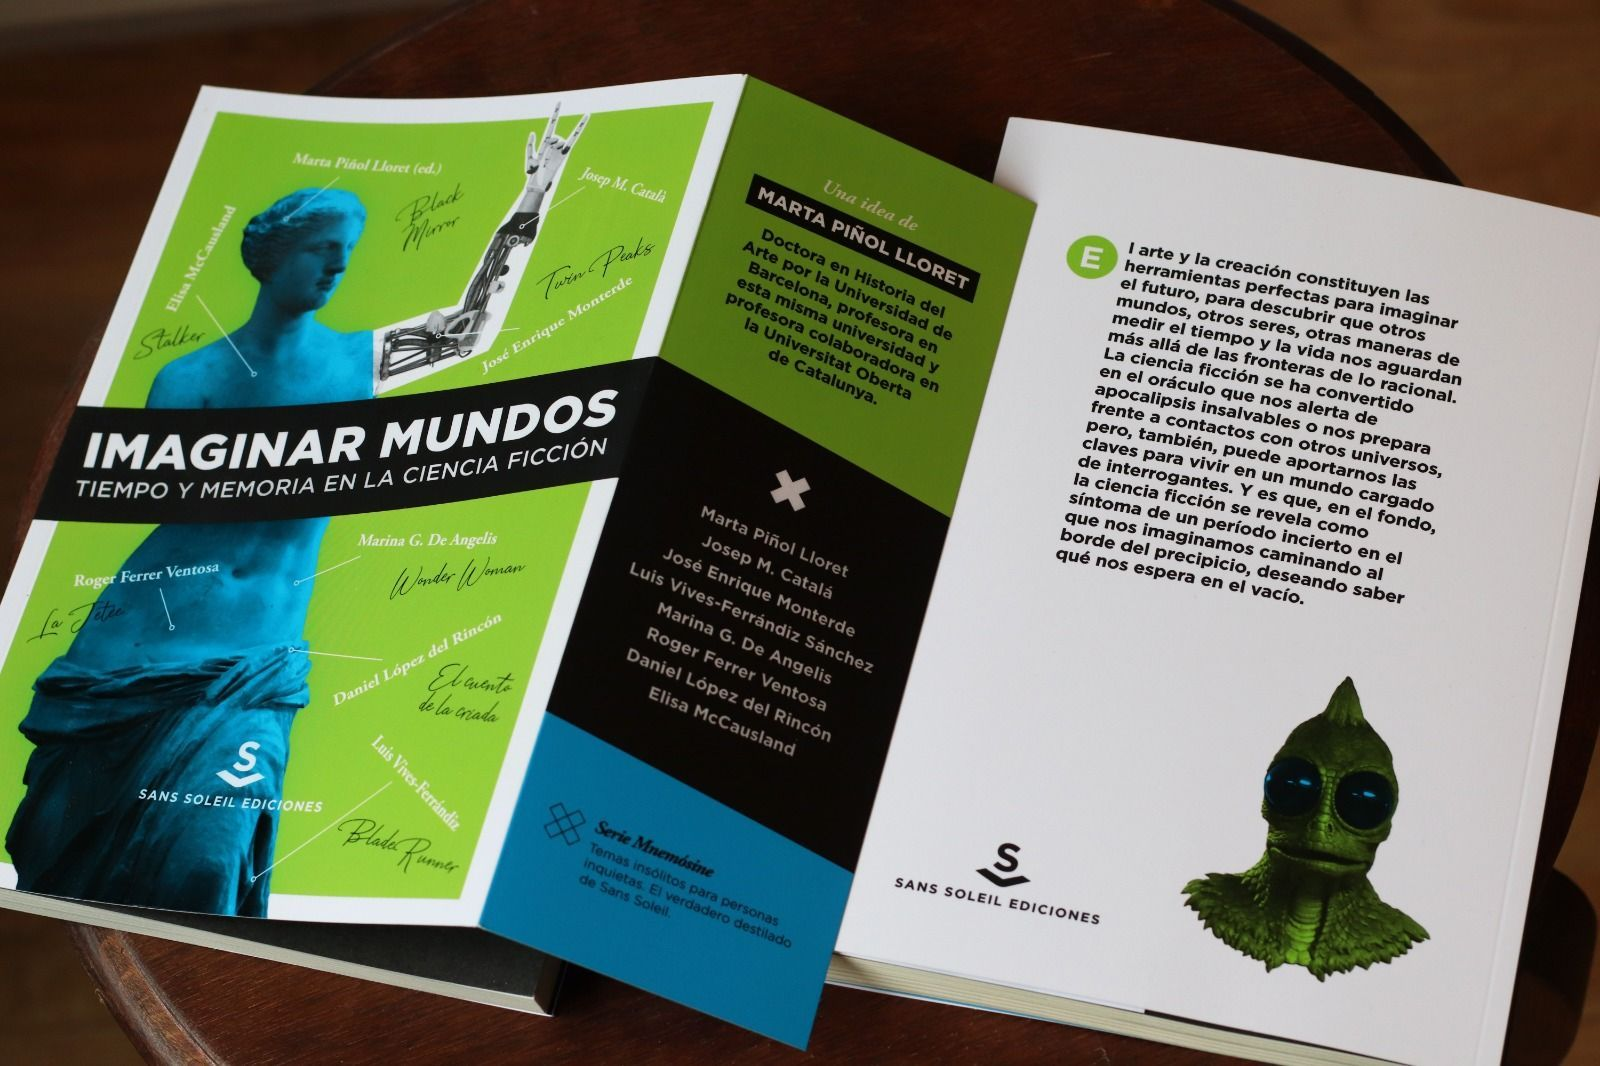 Imaginar Mundos – Sans Soleil Ediciones 2019-05-14 at 19.45.44 (2)